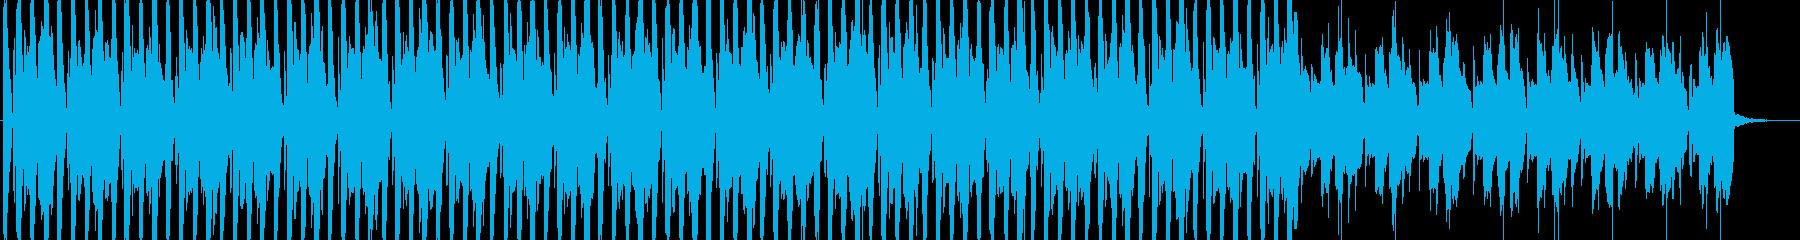 CM等のBGMに適した軽快なサウンドの再生済みの波形